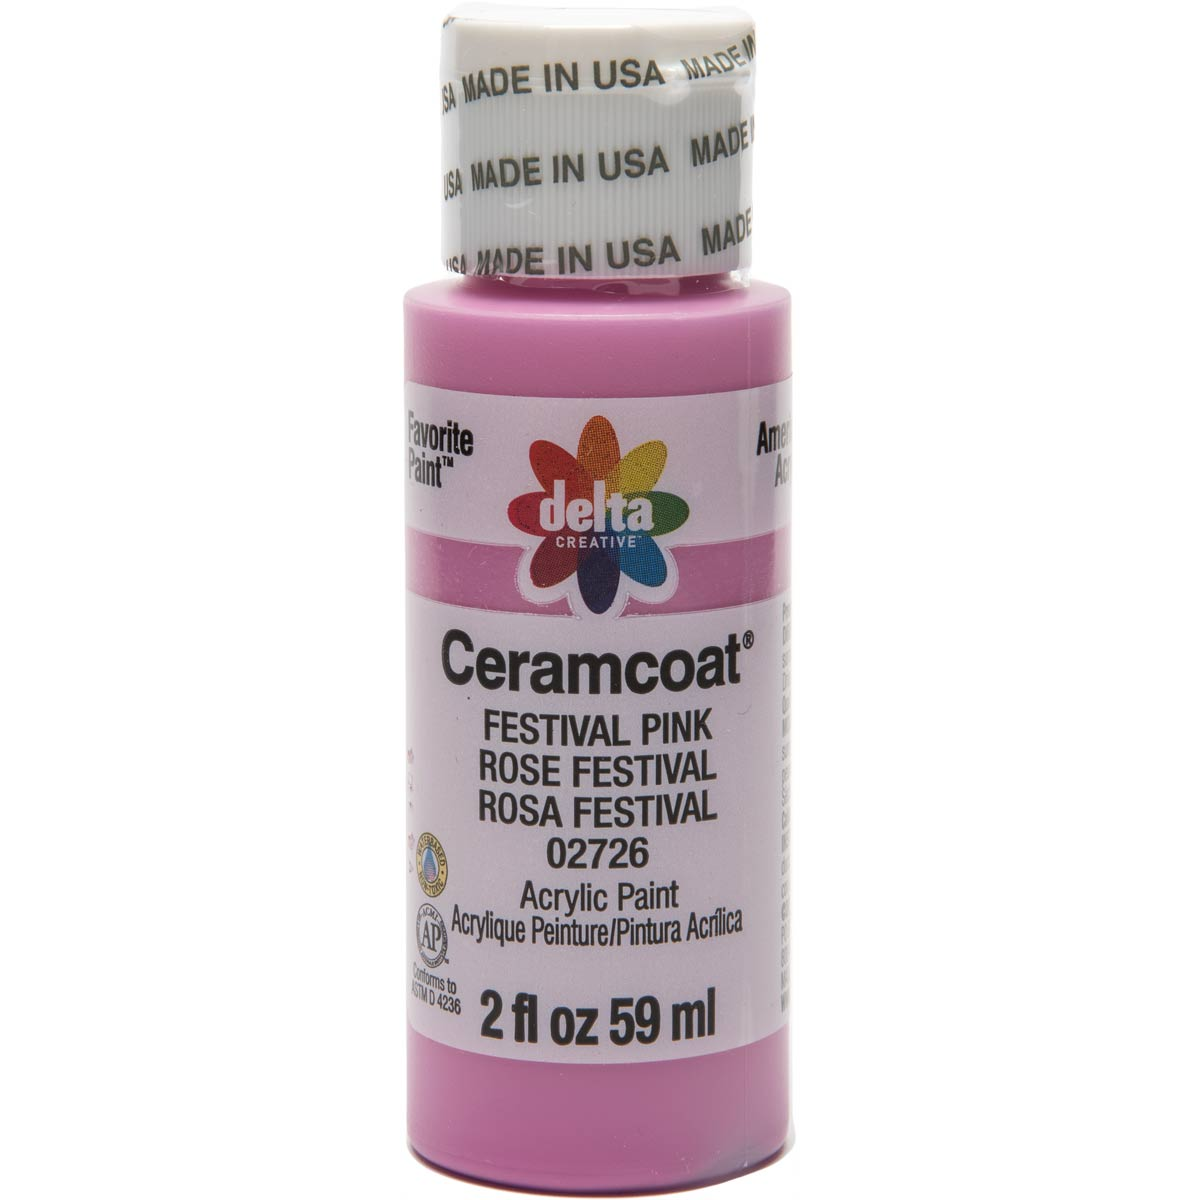 Delta Ceramcoat ® Acrylic Paint - Festival Pink, 2 oz.